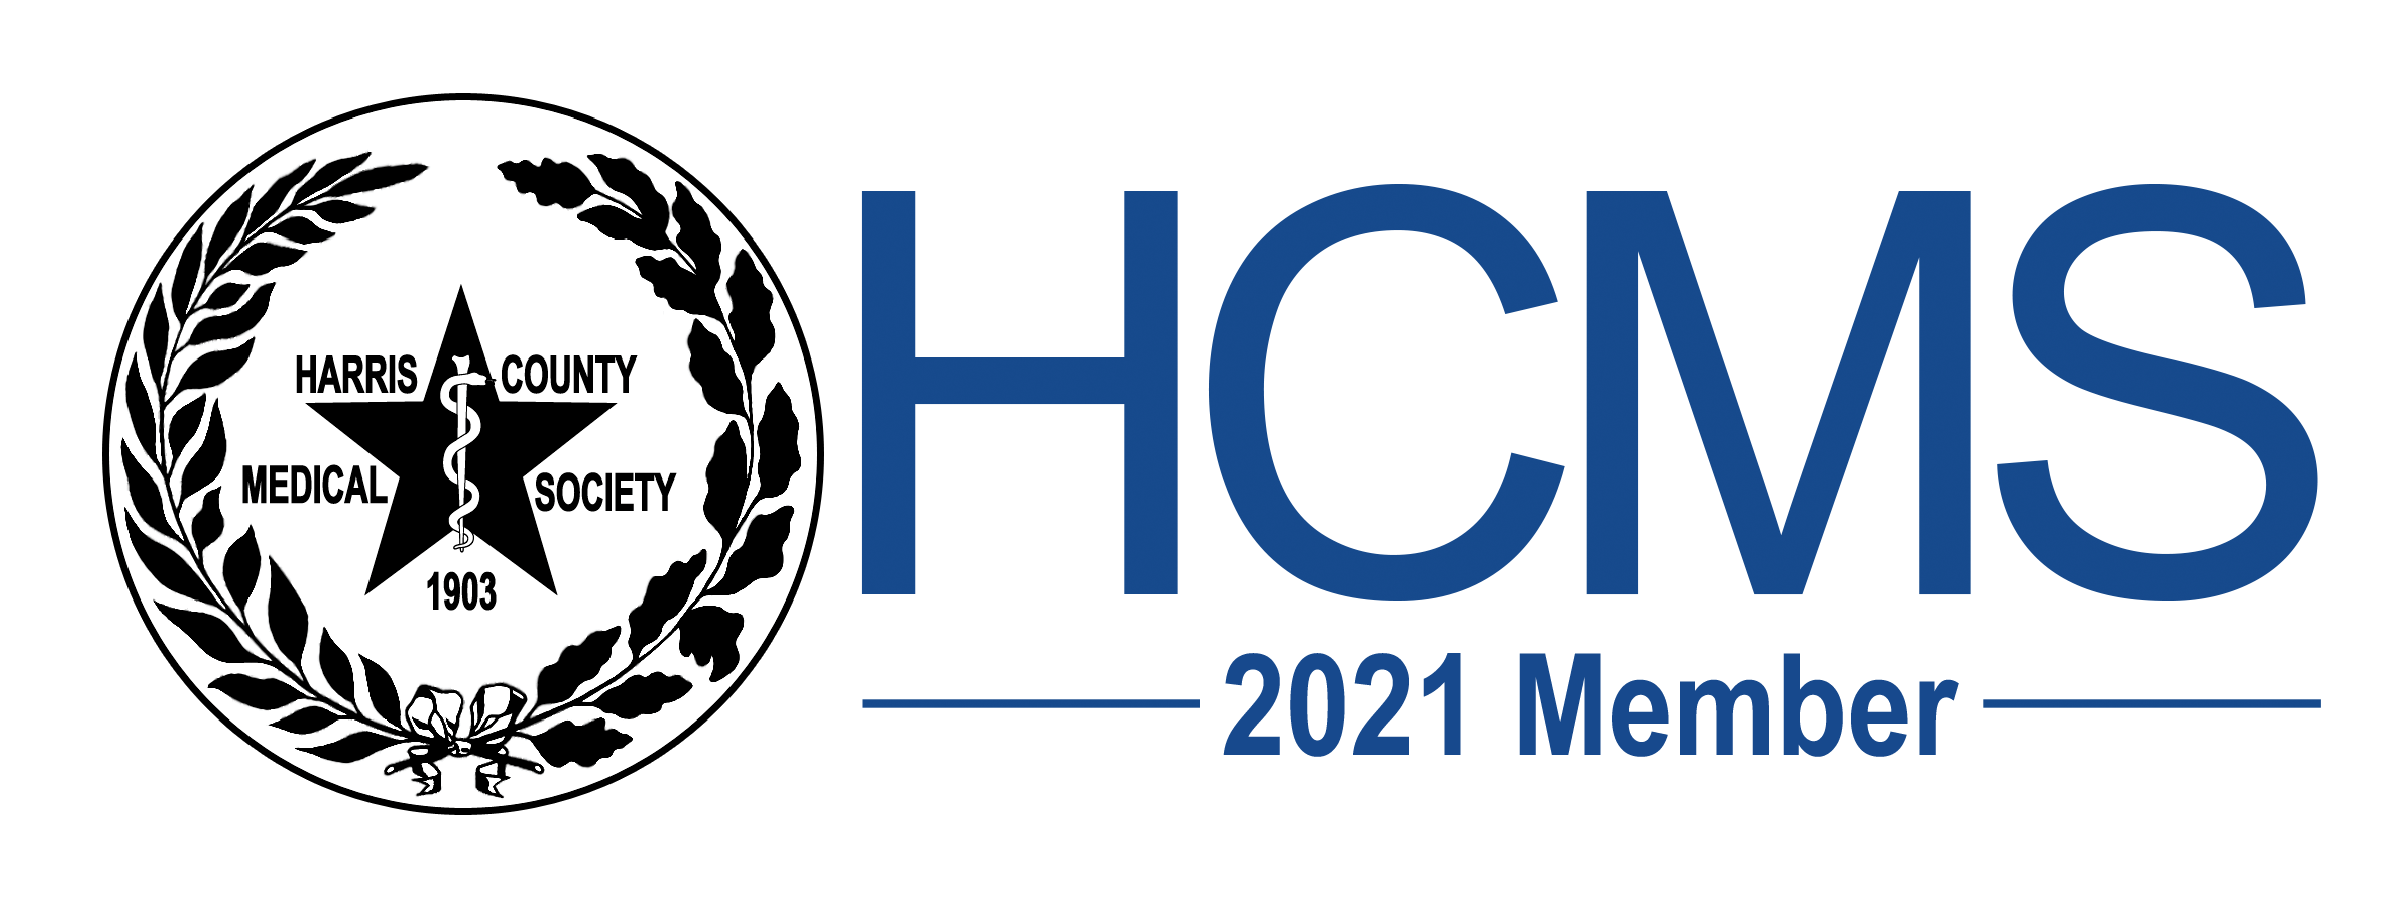 HCMS Member 2021